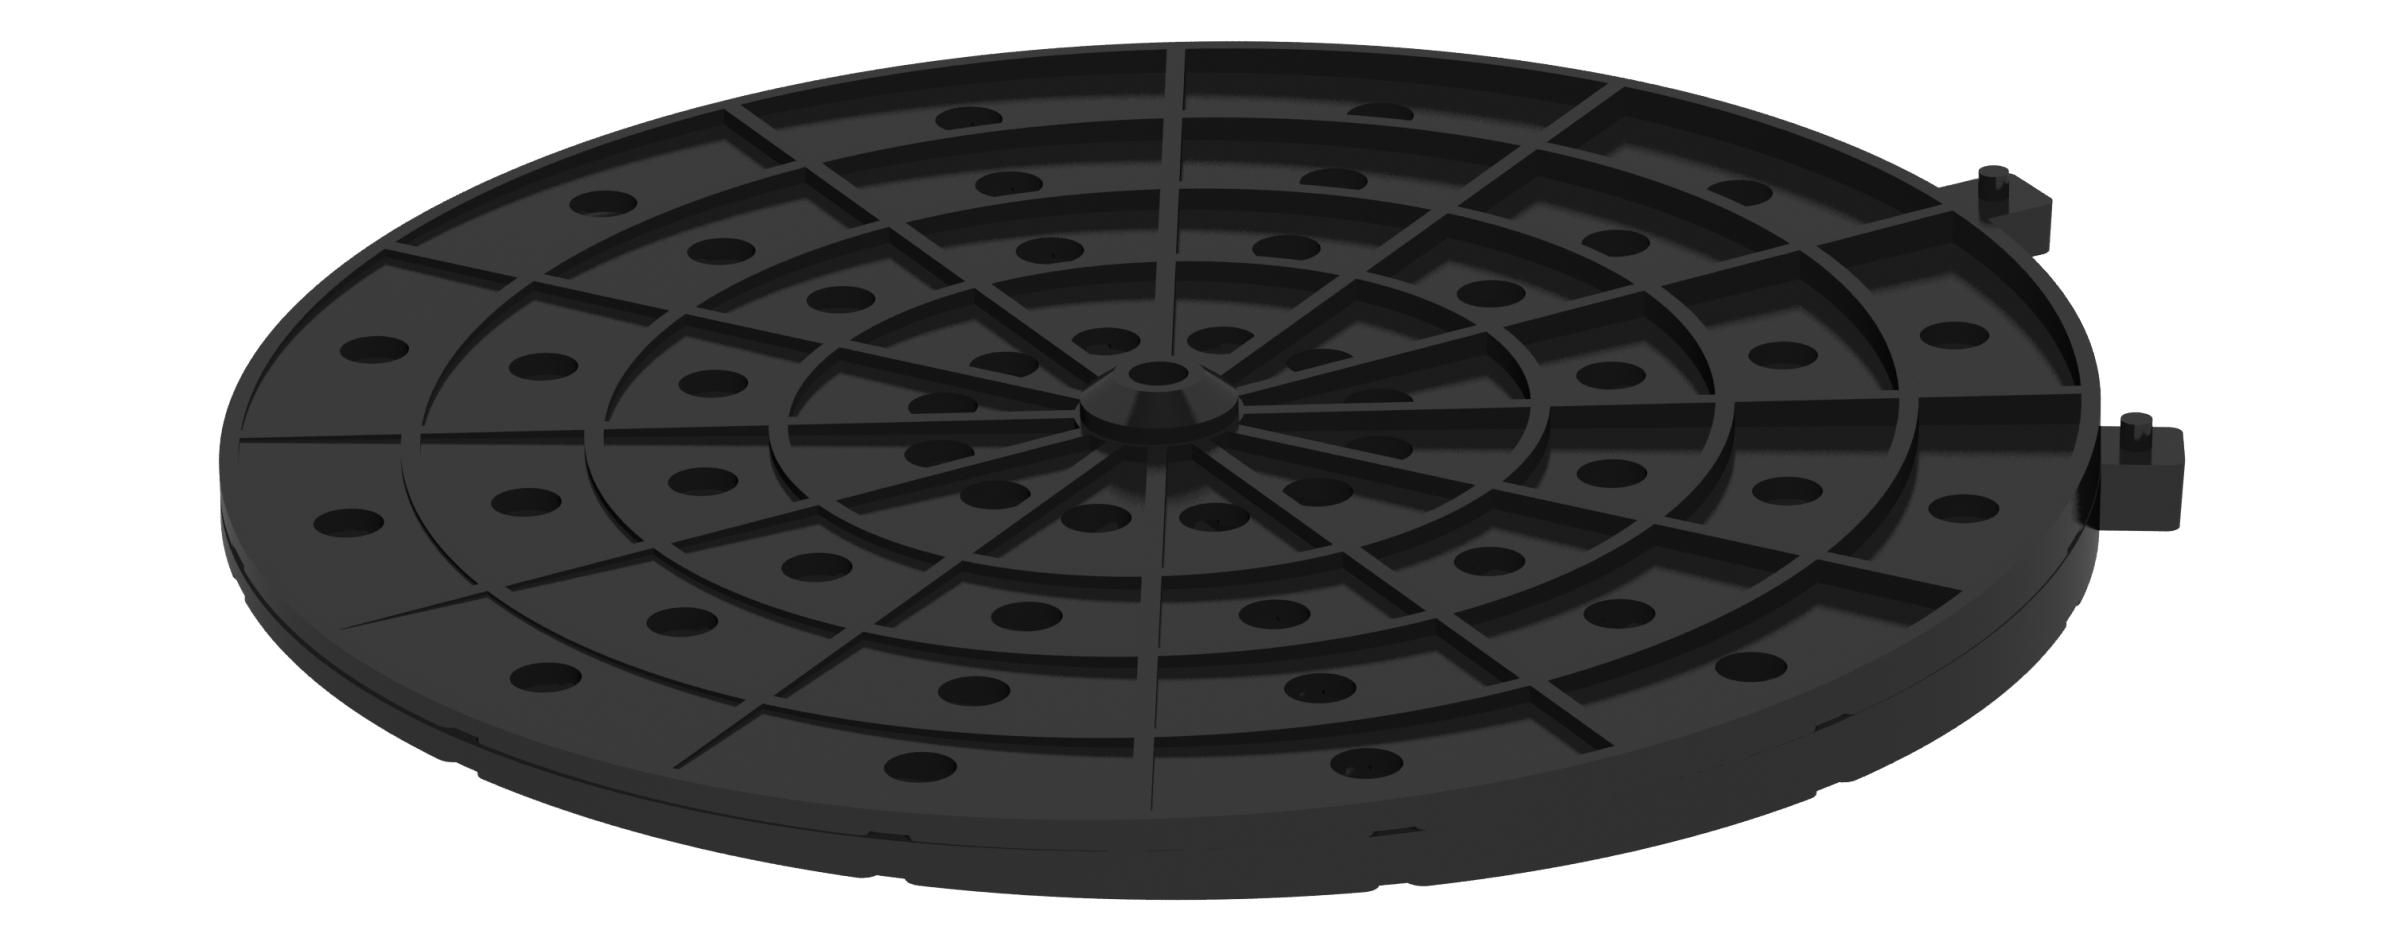 Nivo Decking Pedestal Slope Corrector NPSC-0338